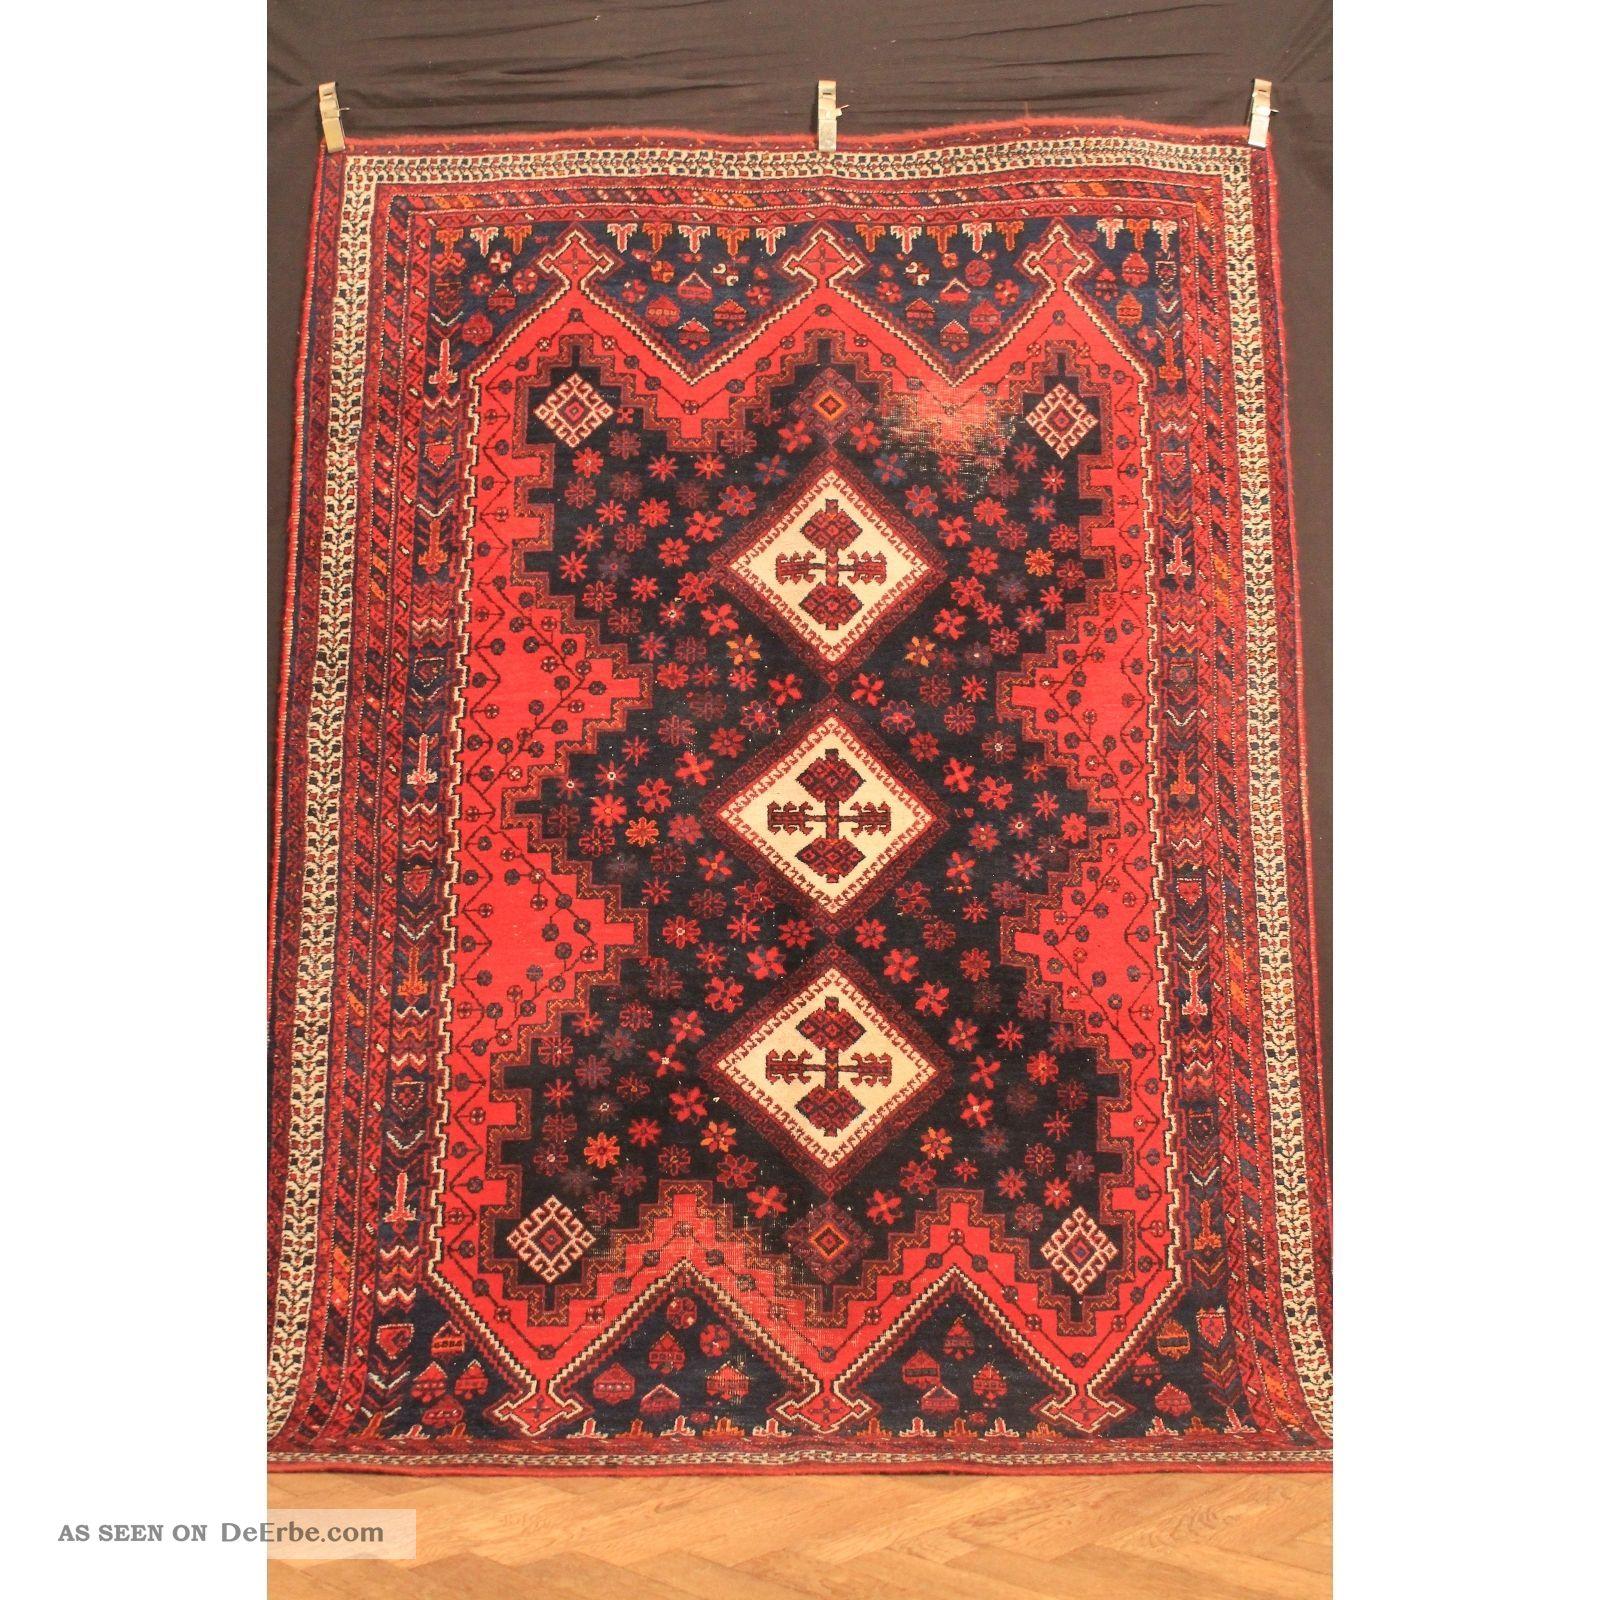 Antik Handgeknüpfter Orient Sammler Teppich Kazak Shi Raz Kasak Carpet 242x172cm Teppiche & Flachgewebe Bild